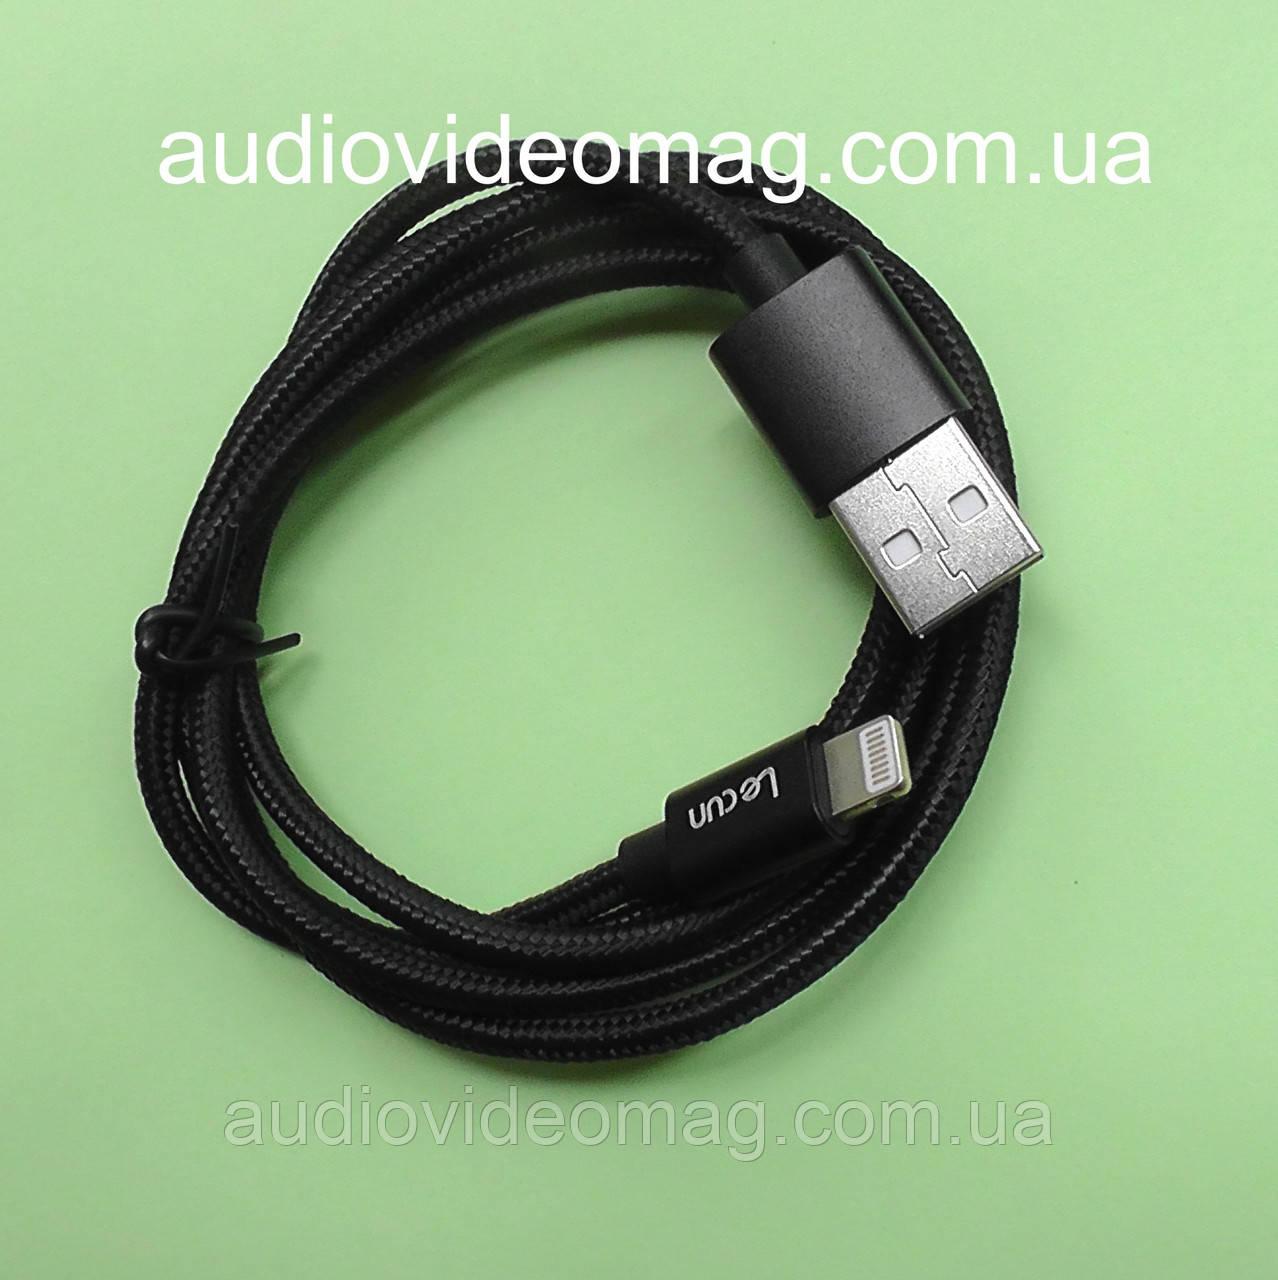 Кабель USB Lightning для Apple iPhone для швидкої зарядки, 3.1 А, довжина 1 м